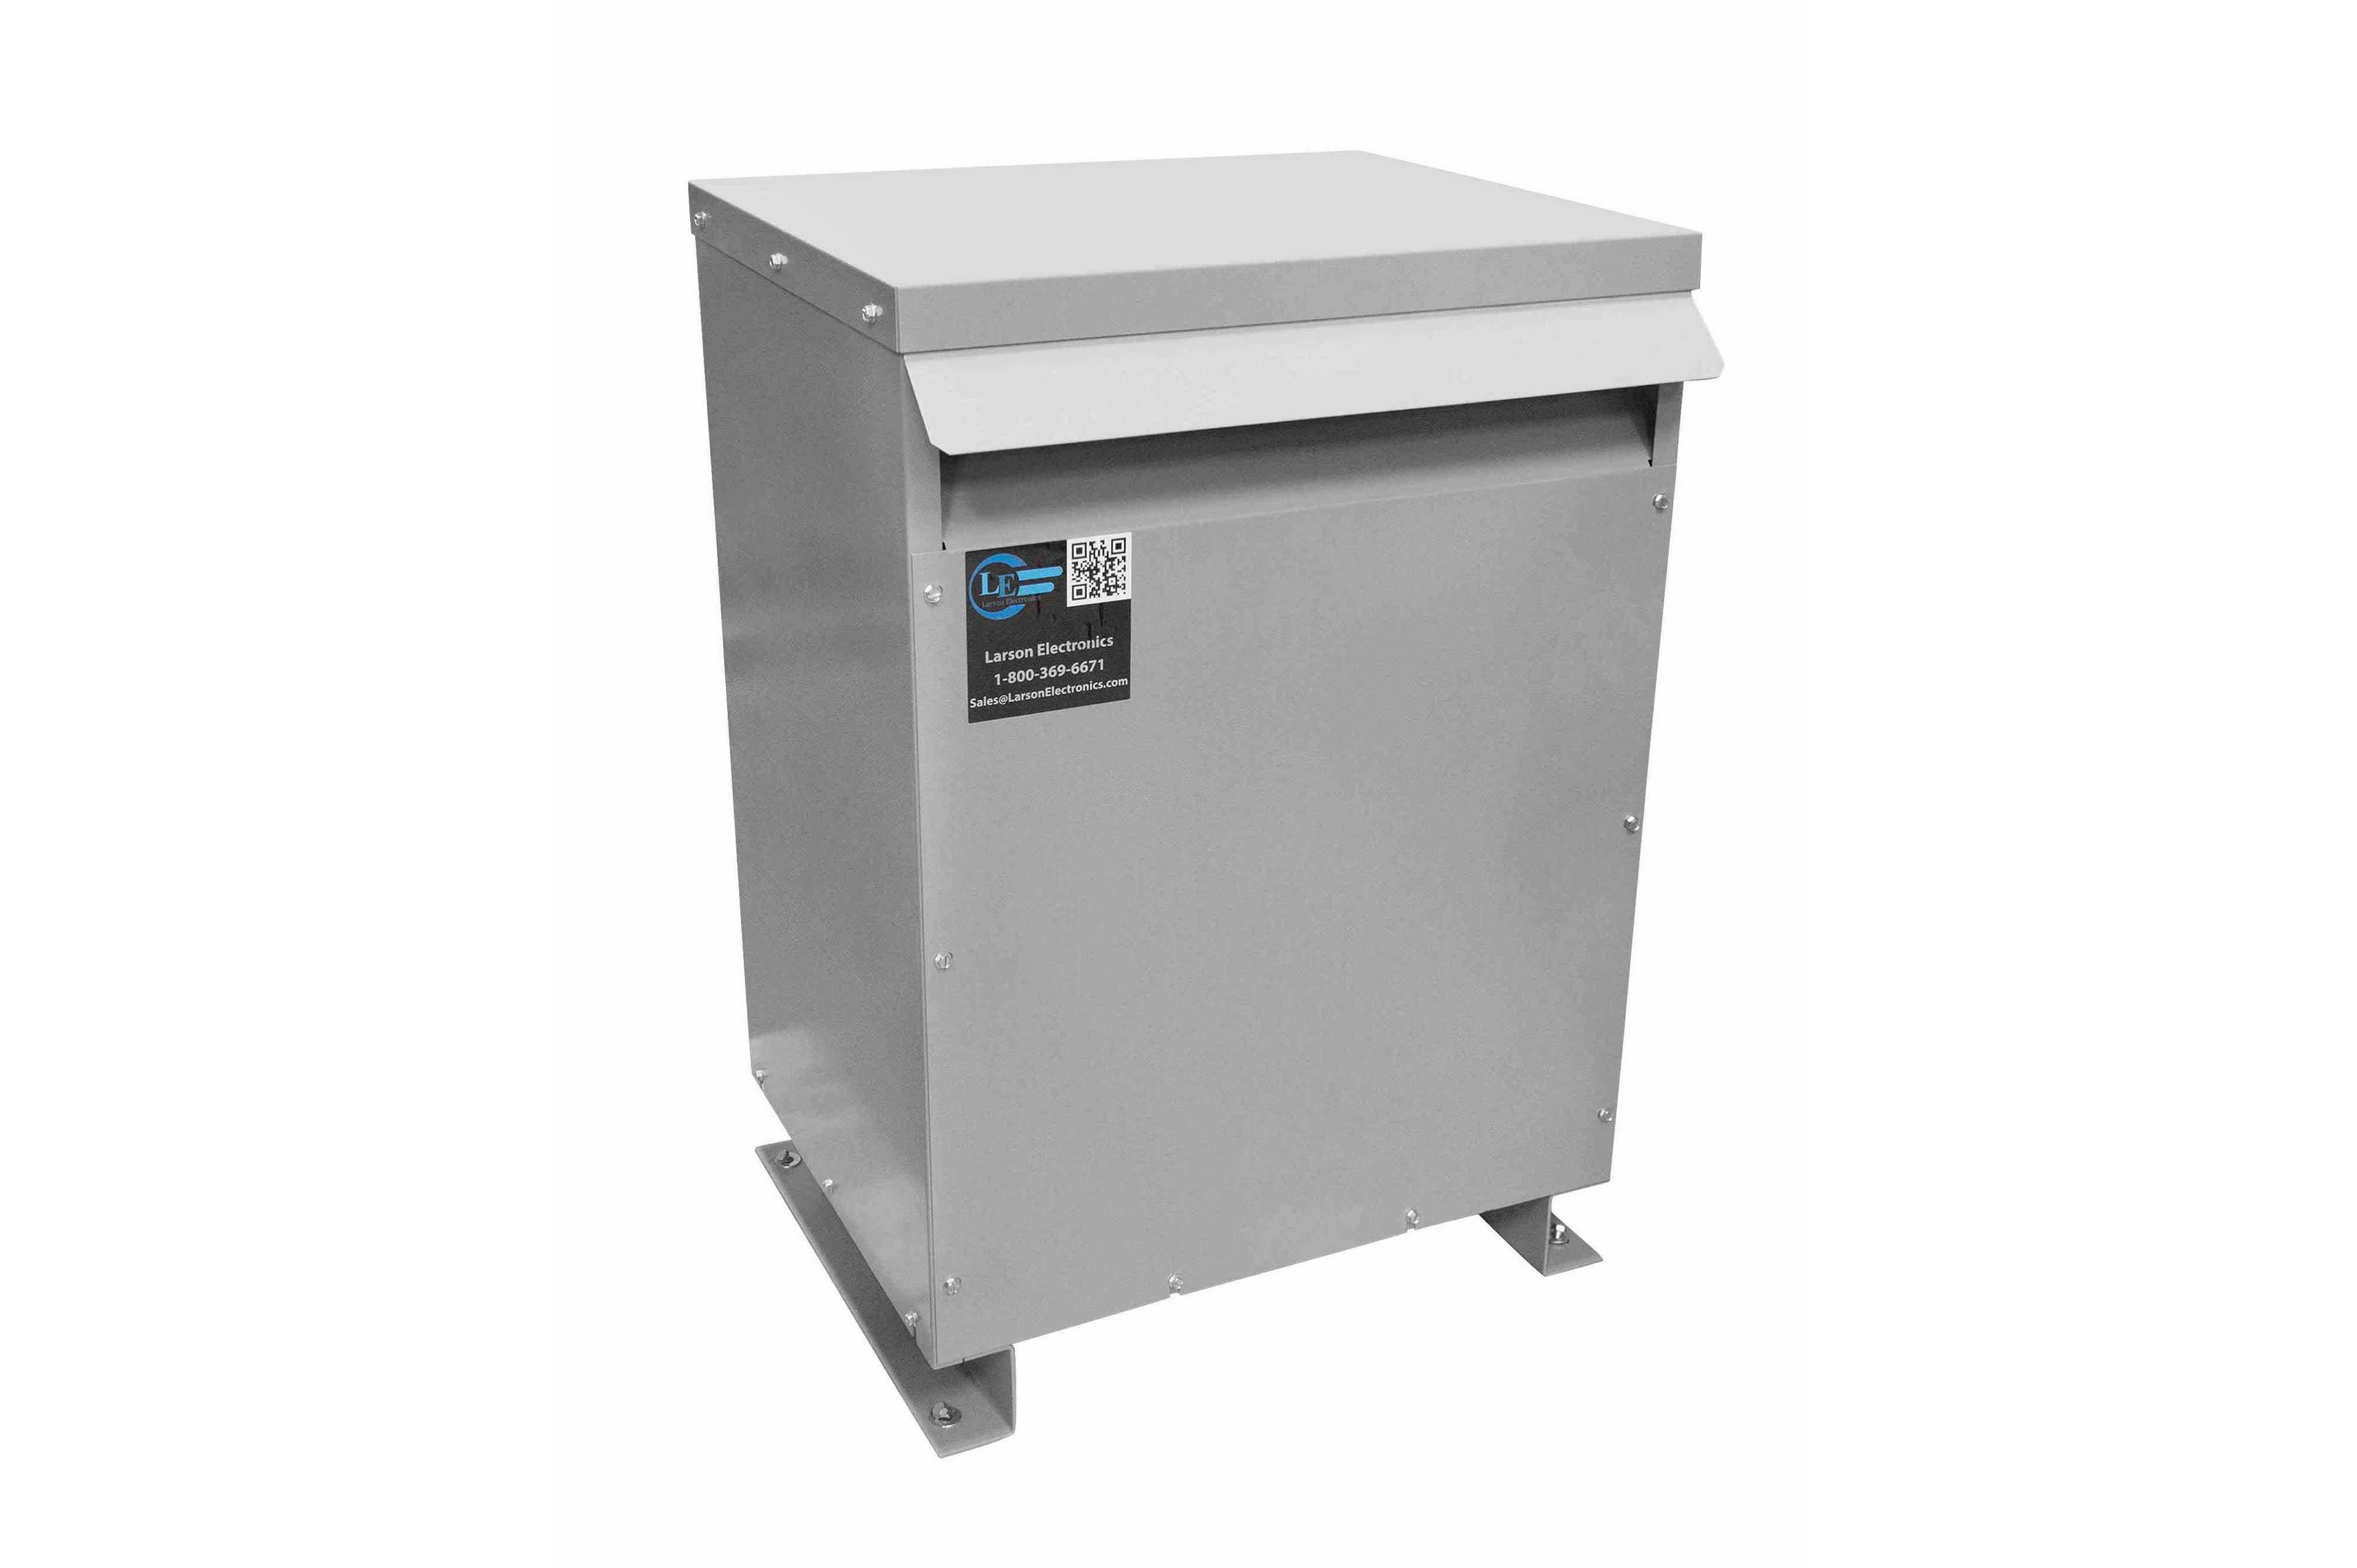 750 kVA 3PH Isolation Transformer, 380V Wye Primary, 600Y/347 Wye-N Secondary, N3R, Ventilated, 60 Hz